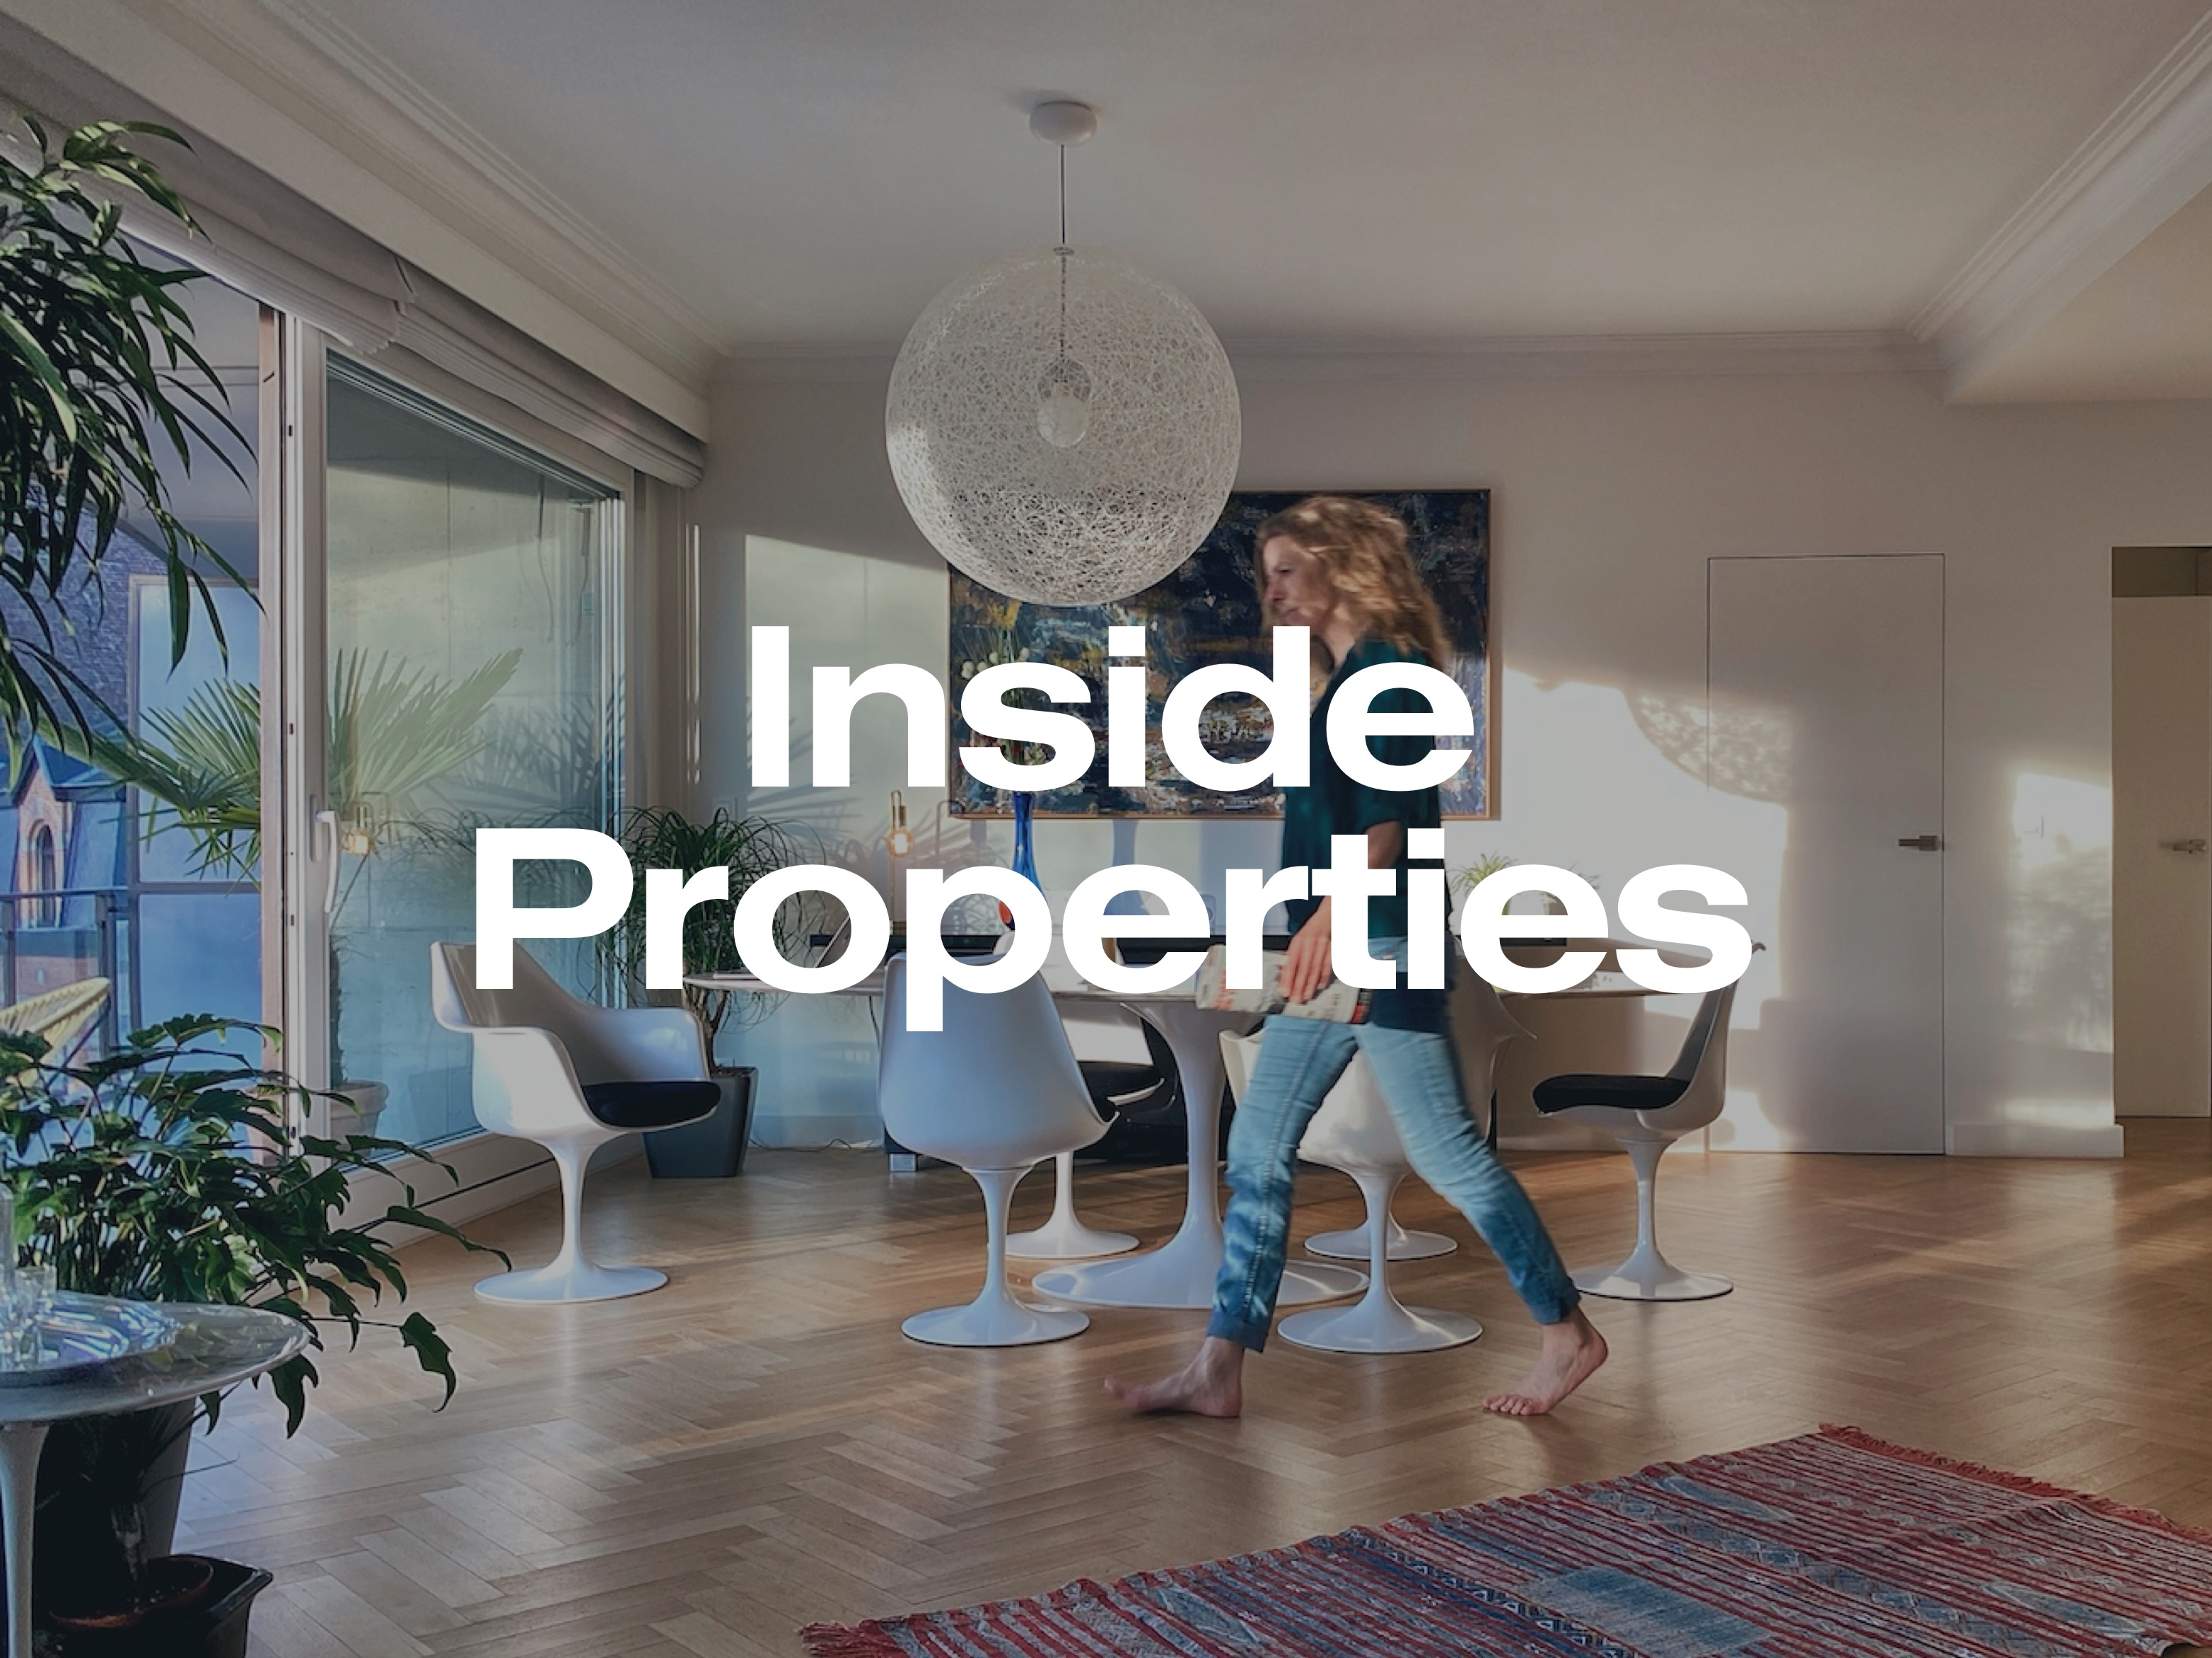 Inside Properties - Création de site internet